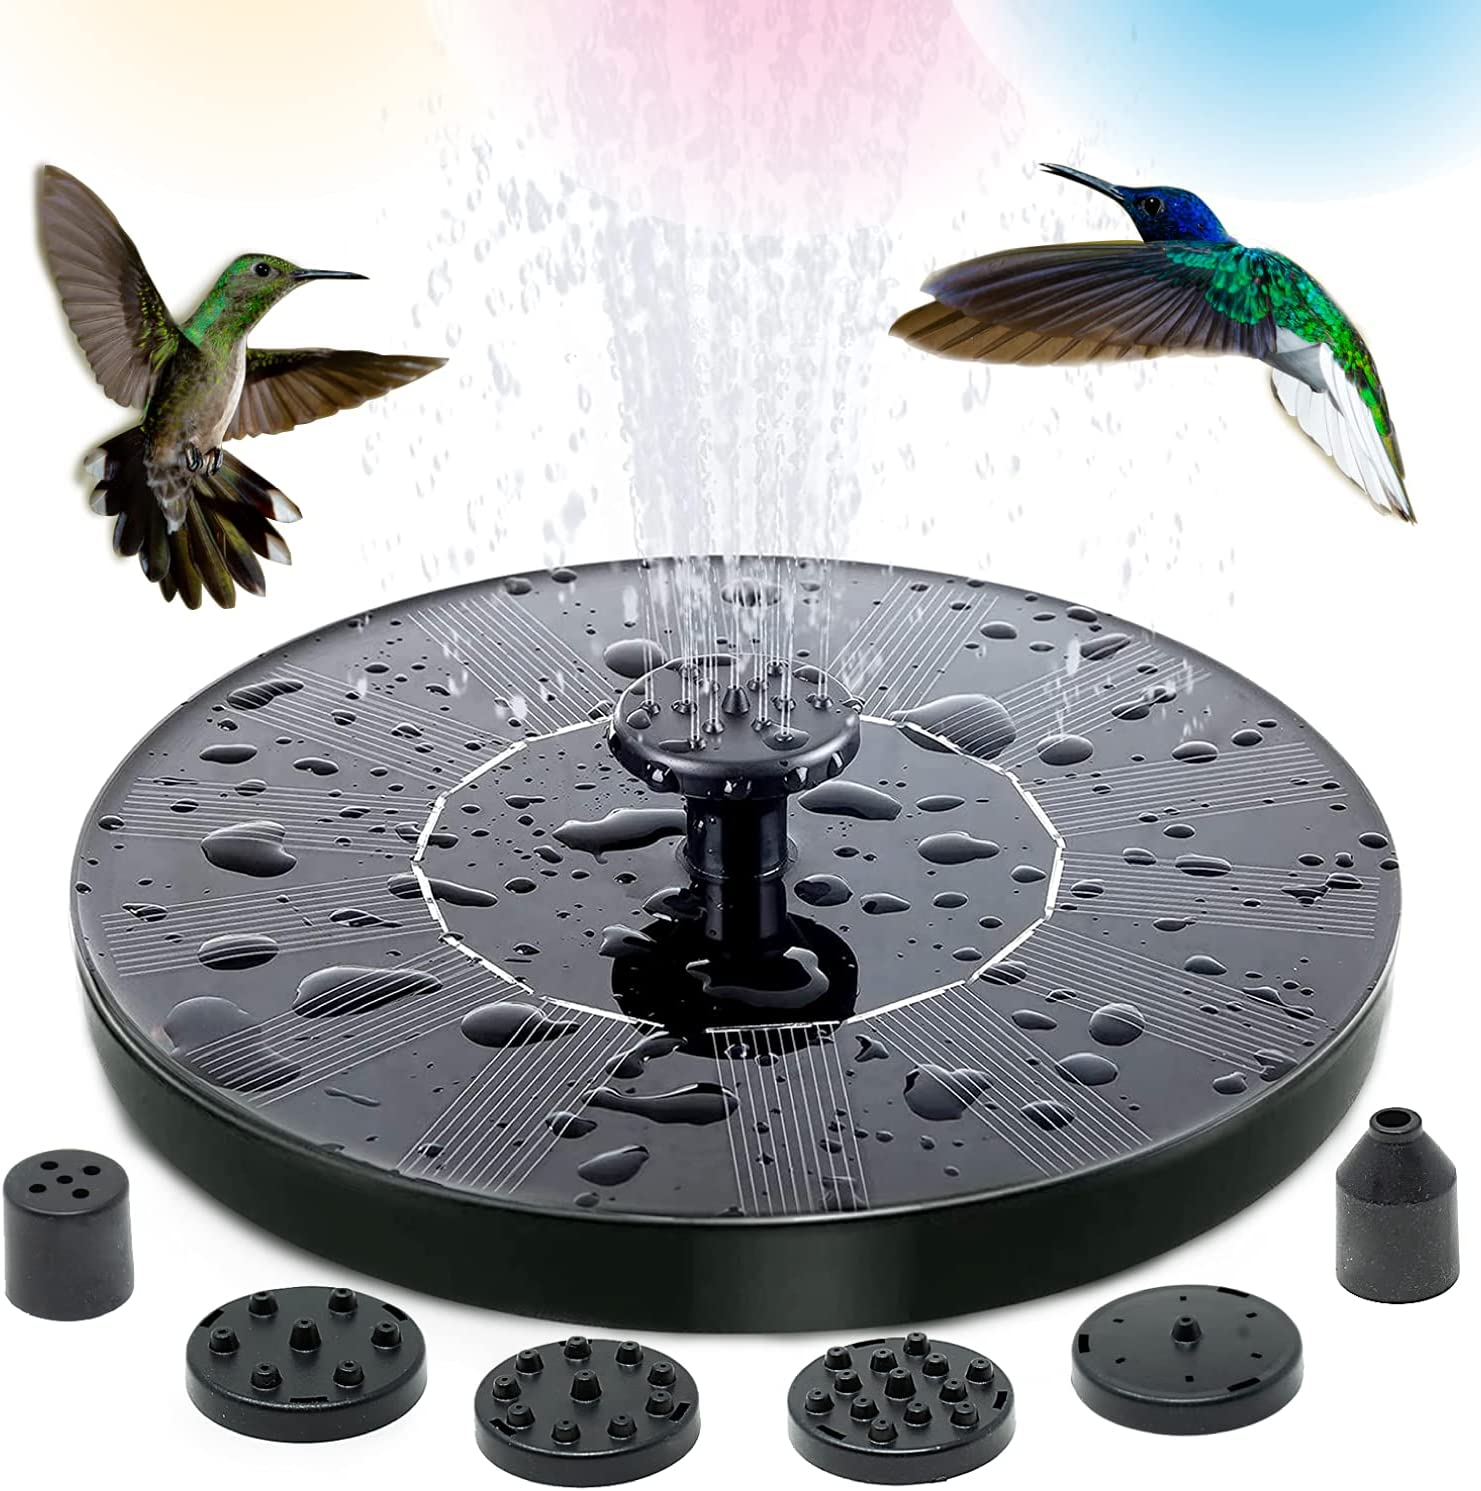 SOLAR POWERED FOUNTAIN PUMP FOR BIRD BATH, EASY TO SET 1.5W FLOATING SOLAR WATER PUMP WITH 6 NOZZLES FOR GARDEN, POND, FOUNTAIN, POOL, BIRD BATH